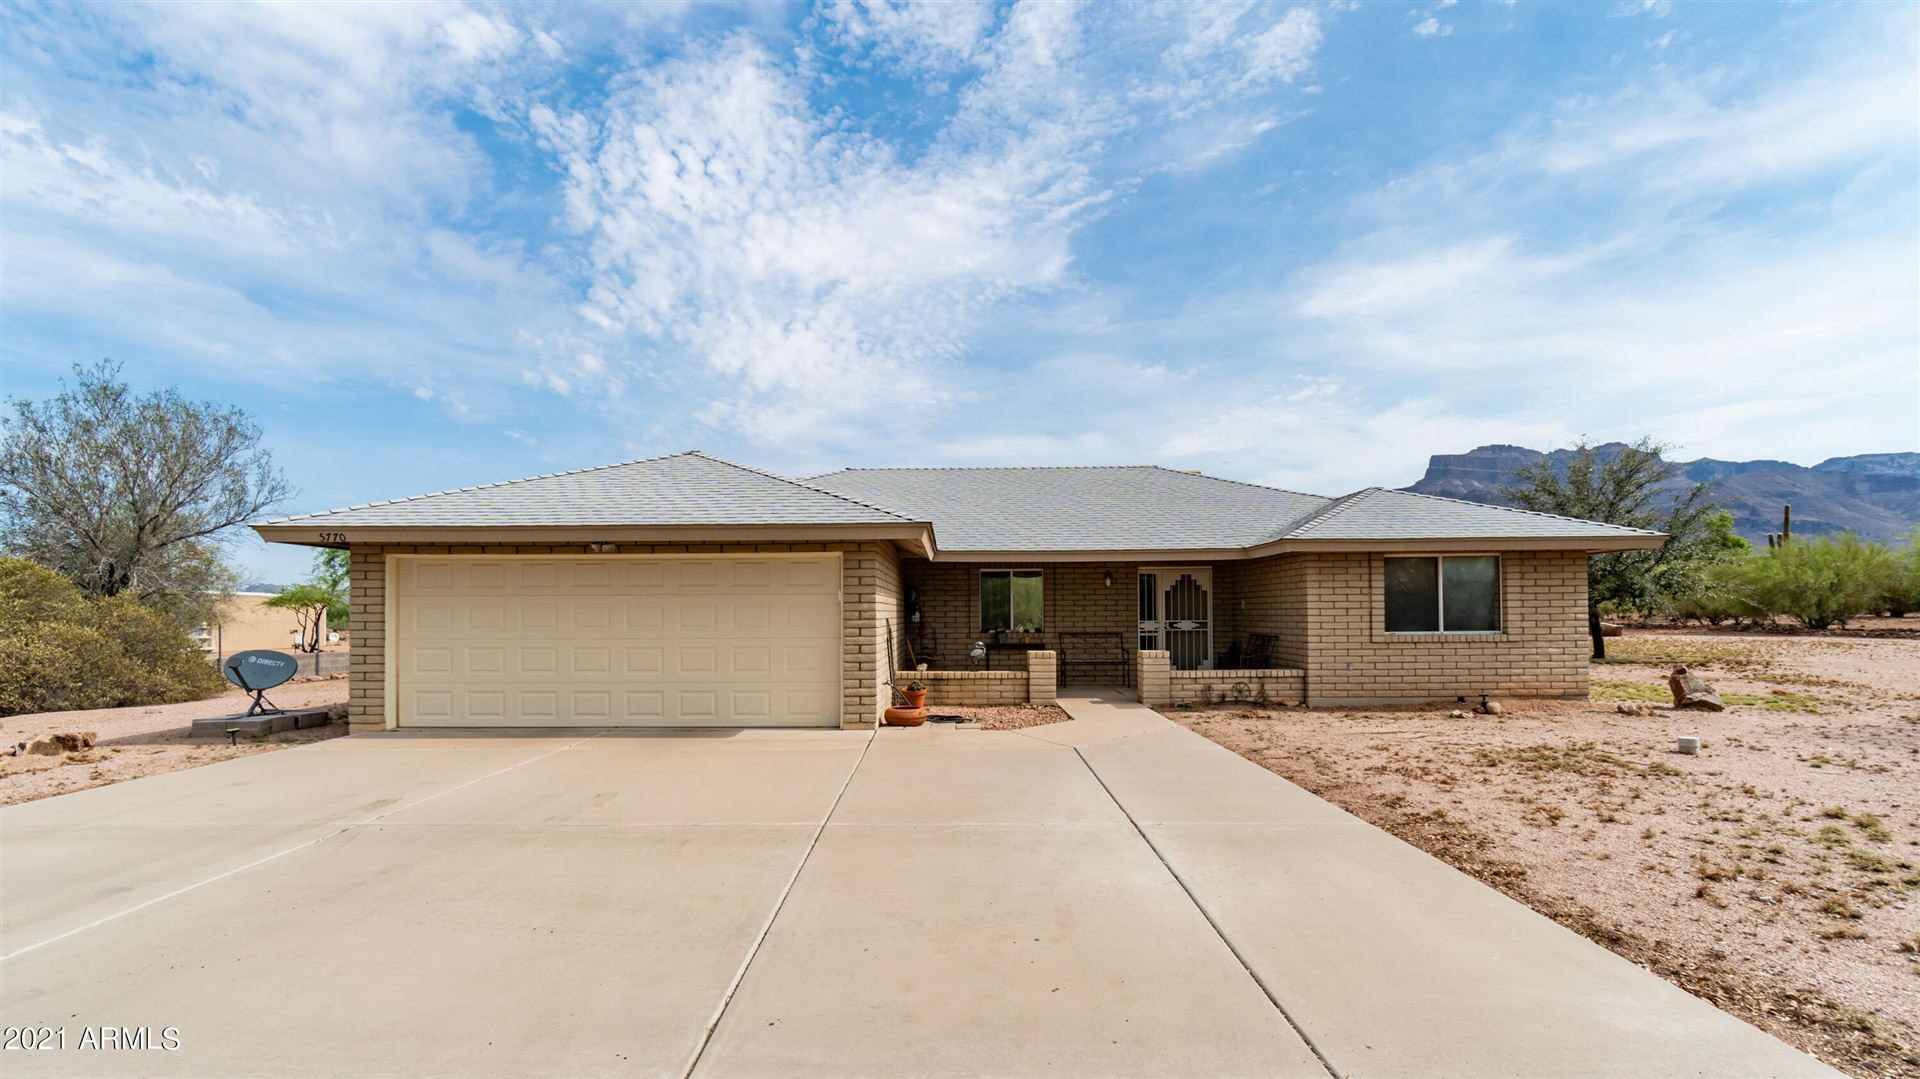 Photo of 5770 E 22nd Avenue, Apache Junction, AZ 85119 (MLS # 6267795)